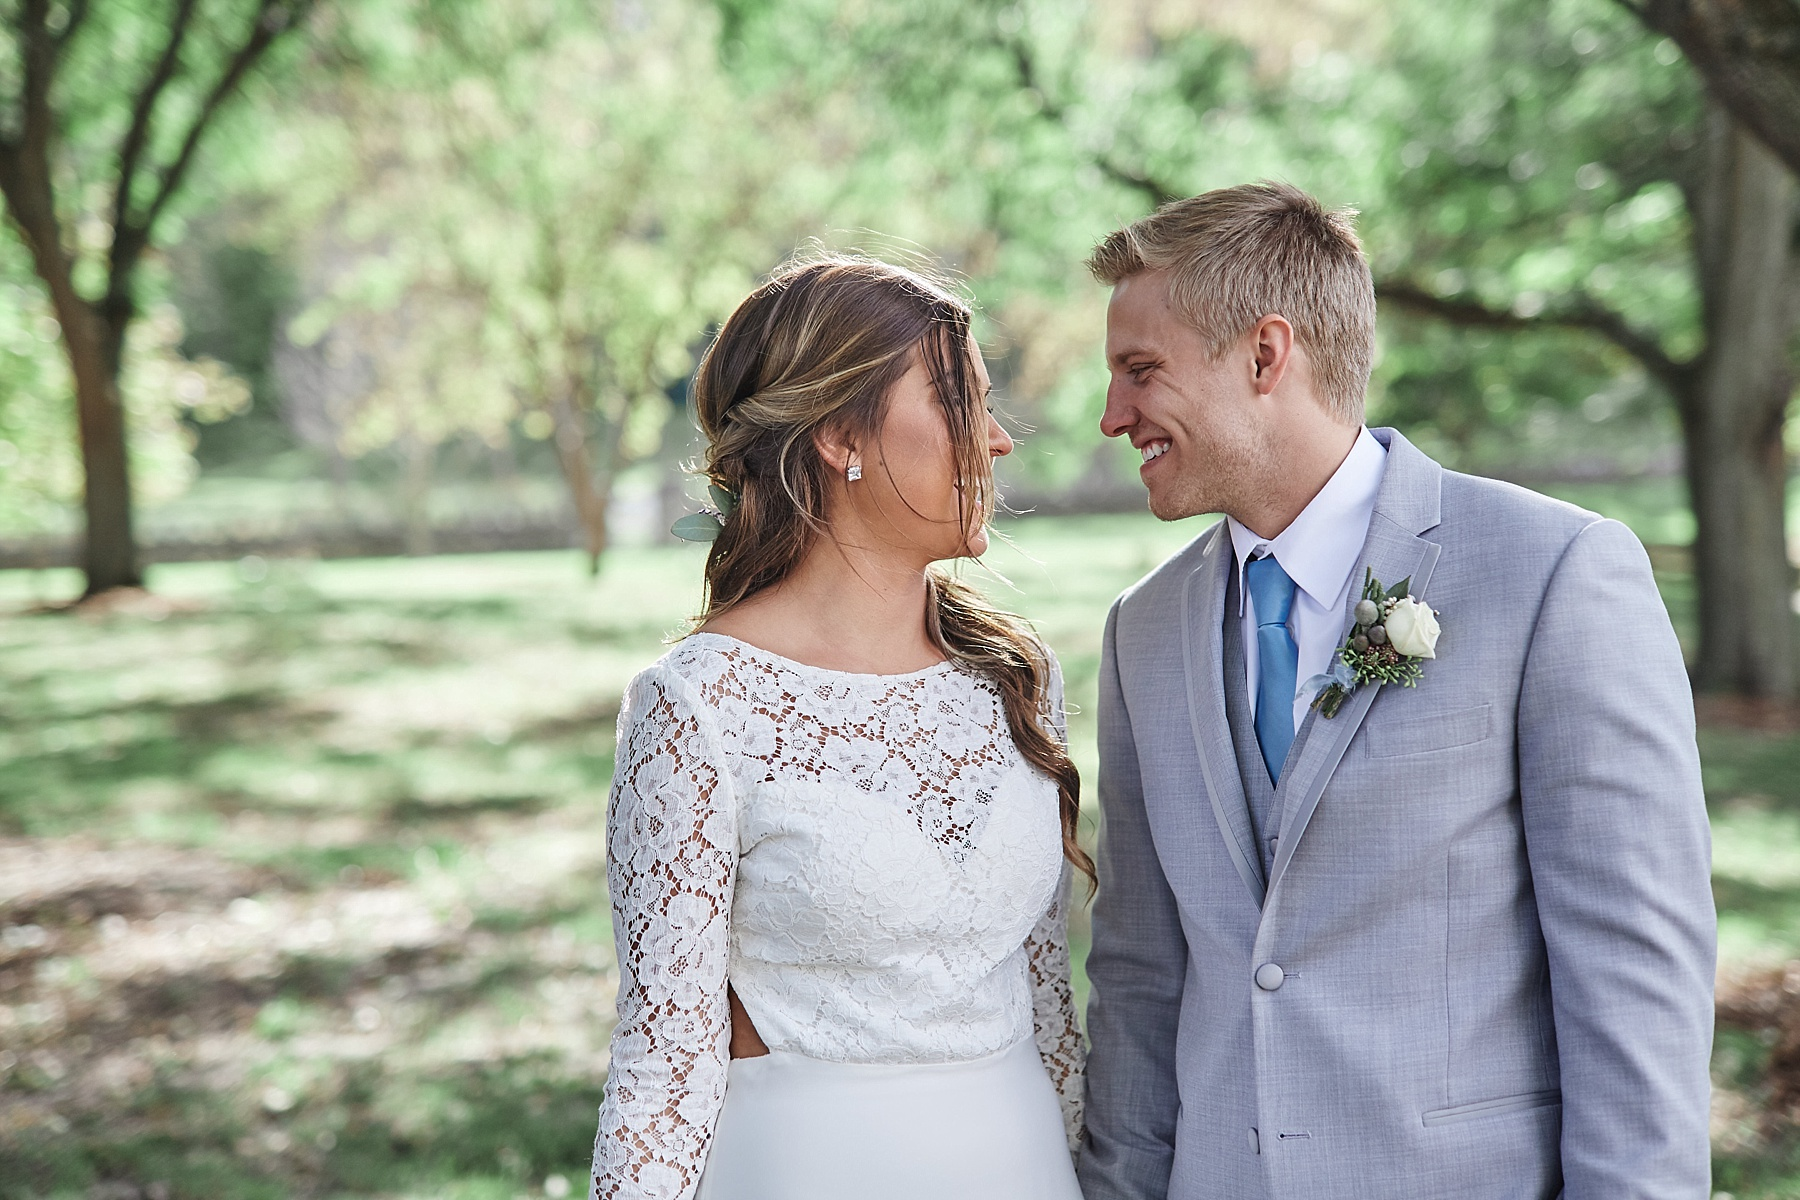 Maywood-Stone-Barn-Wedding-Rochester-Minnesota-Perry-James-Photo_0623.jpg